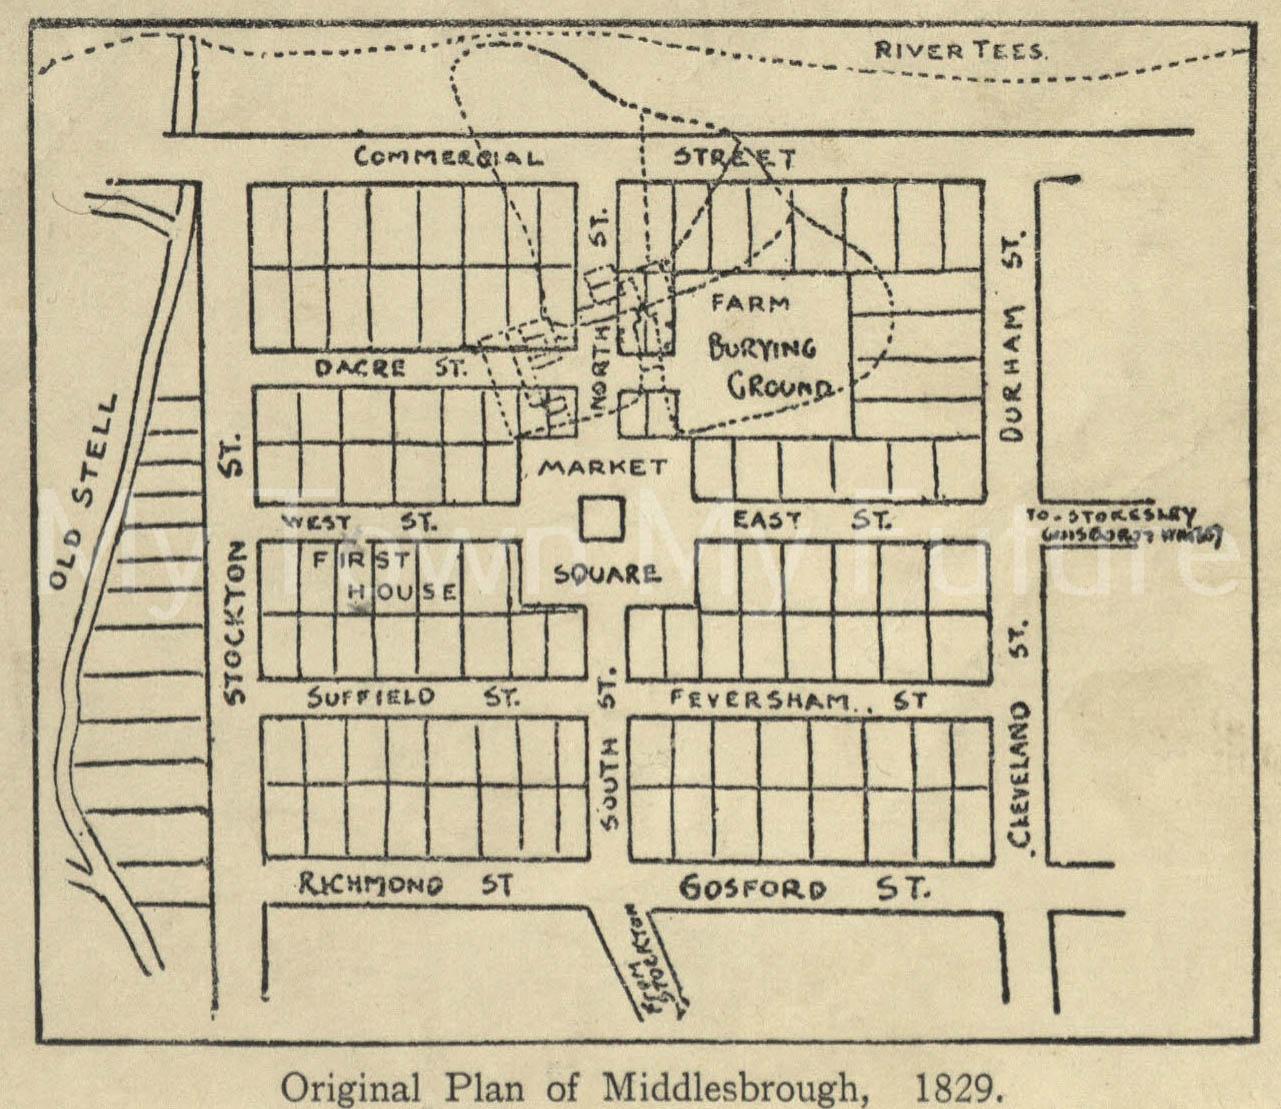 Original plan of Middlesbrough 1829.